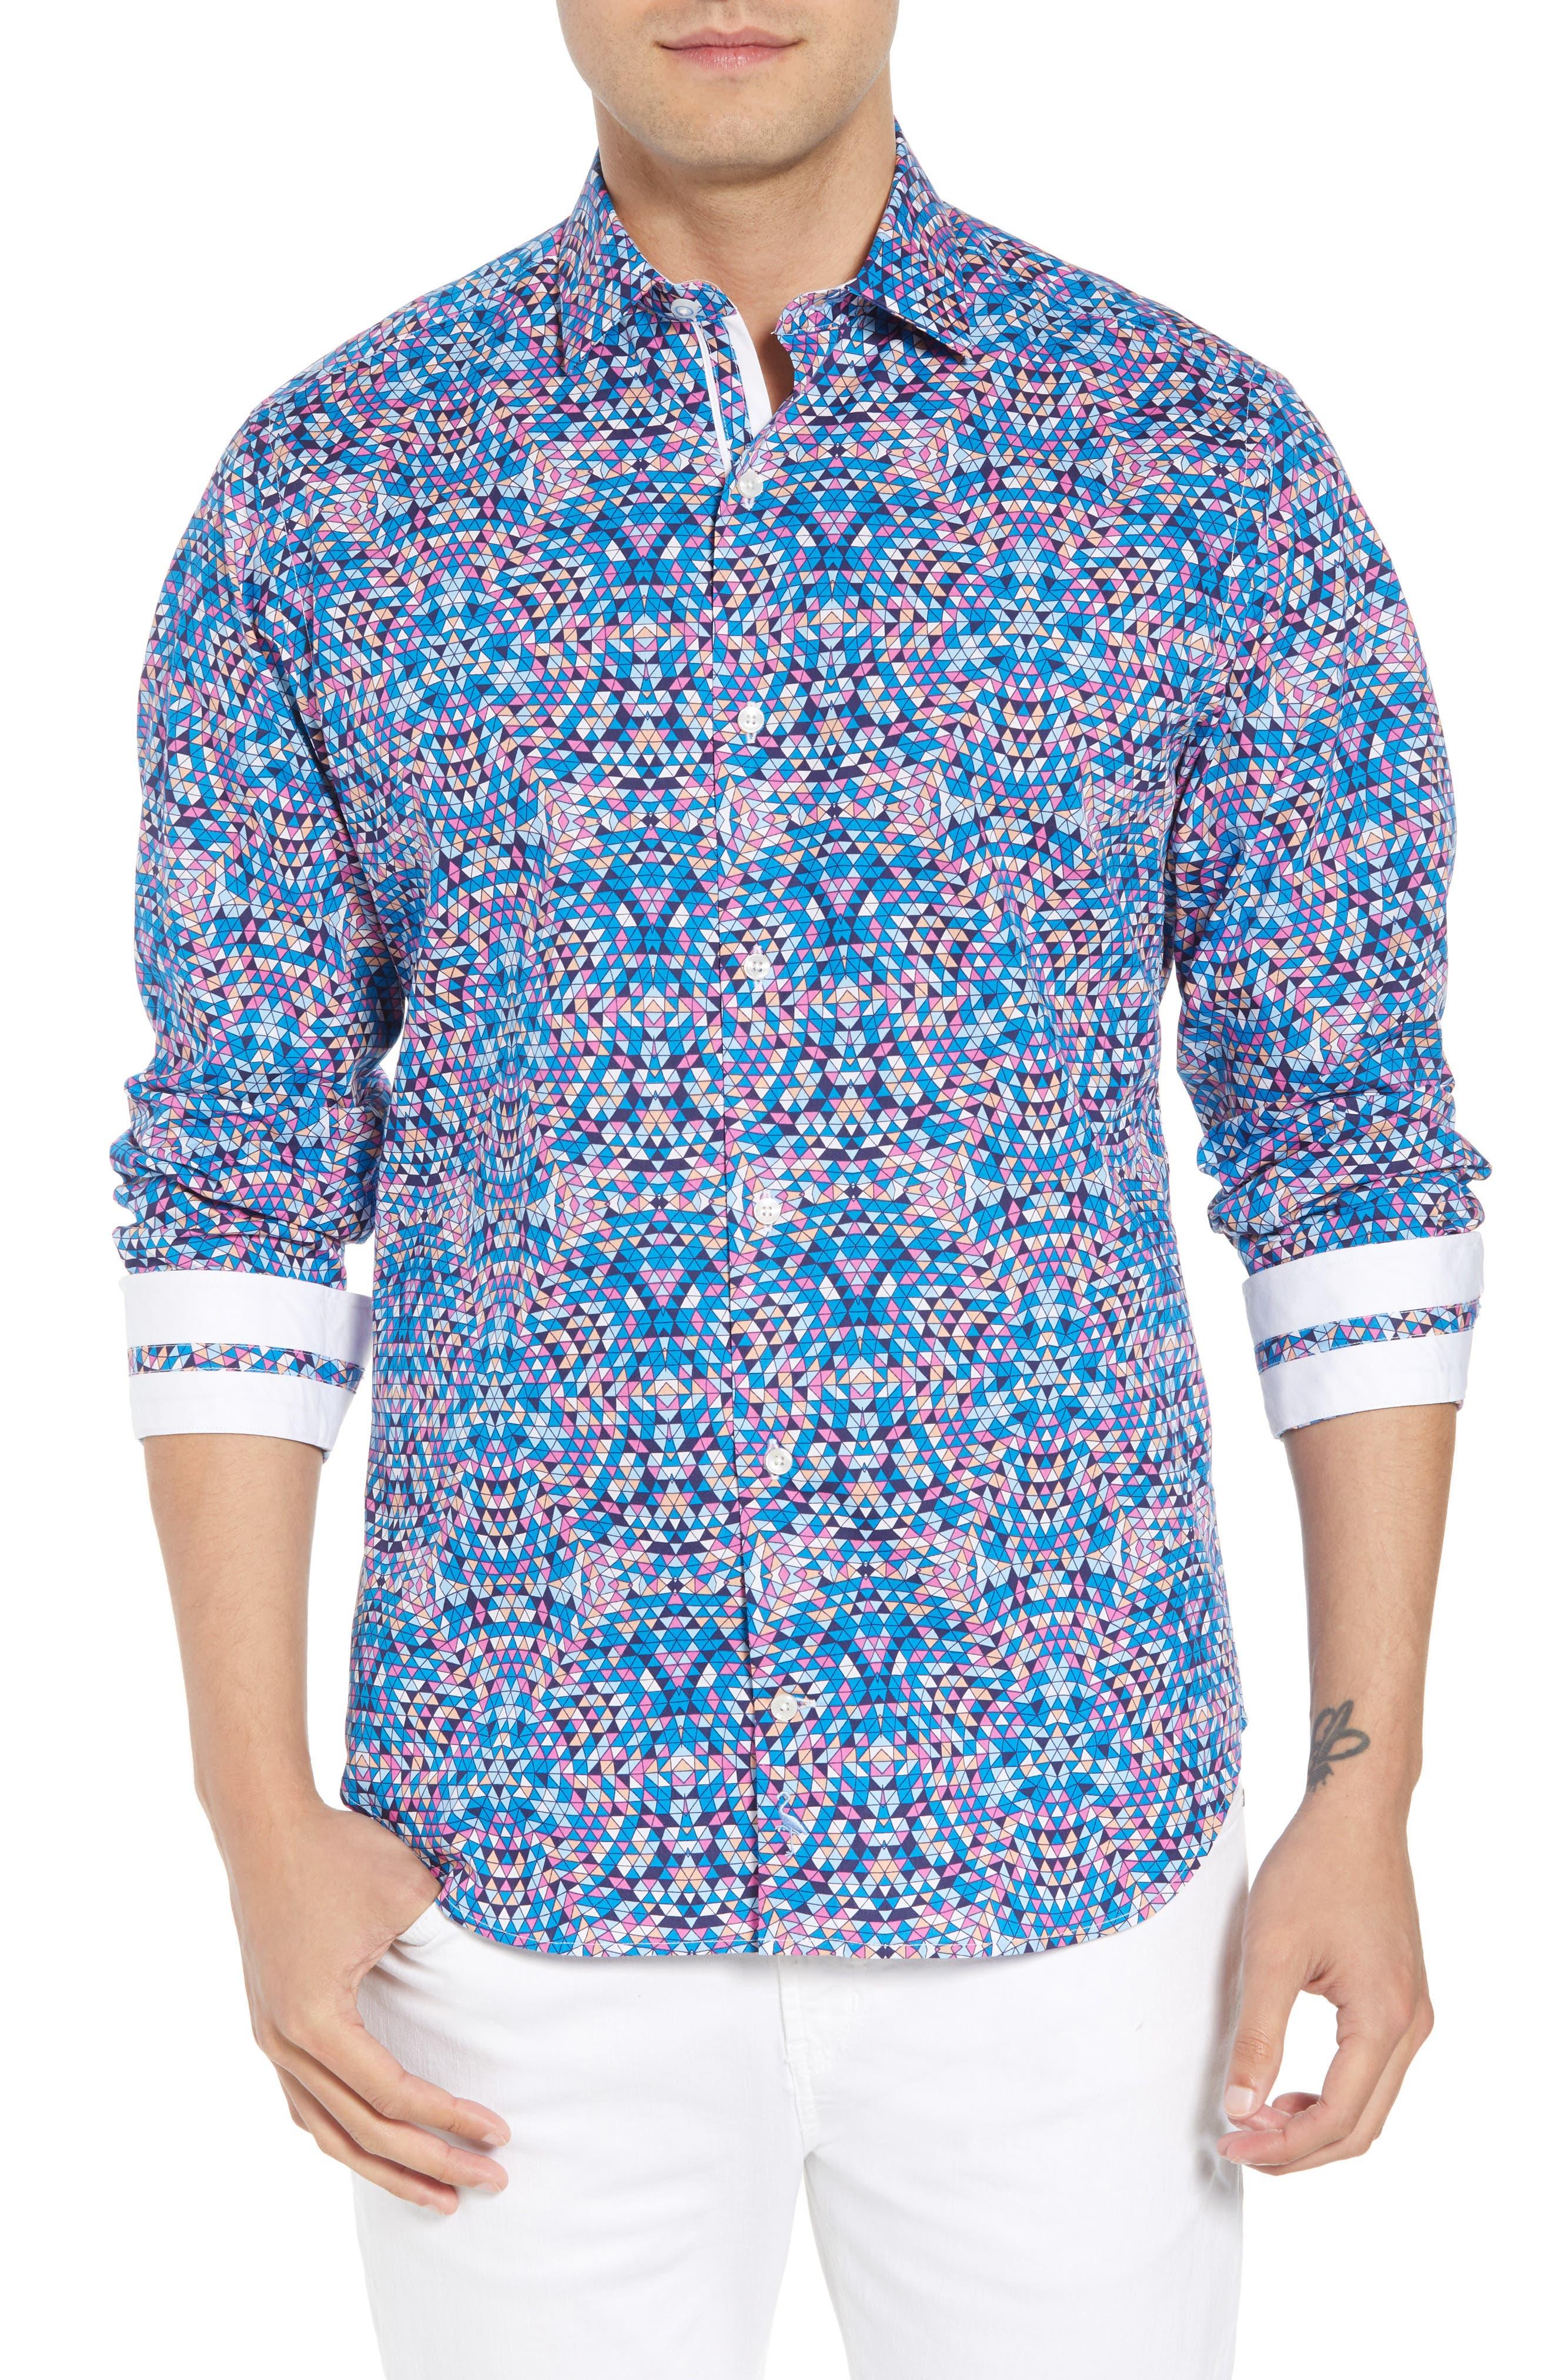 Alden Regular Fit Sport Shirt,                             Main thumbnail 1, color,                             Teal